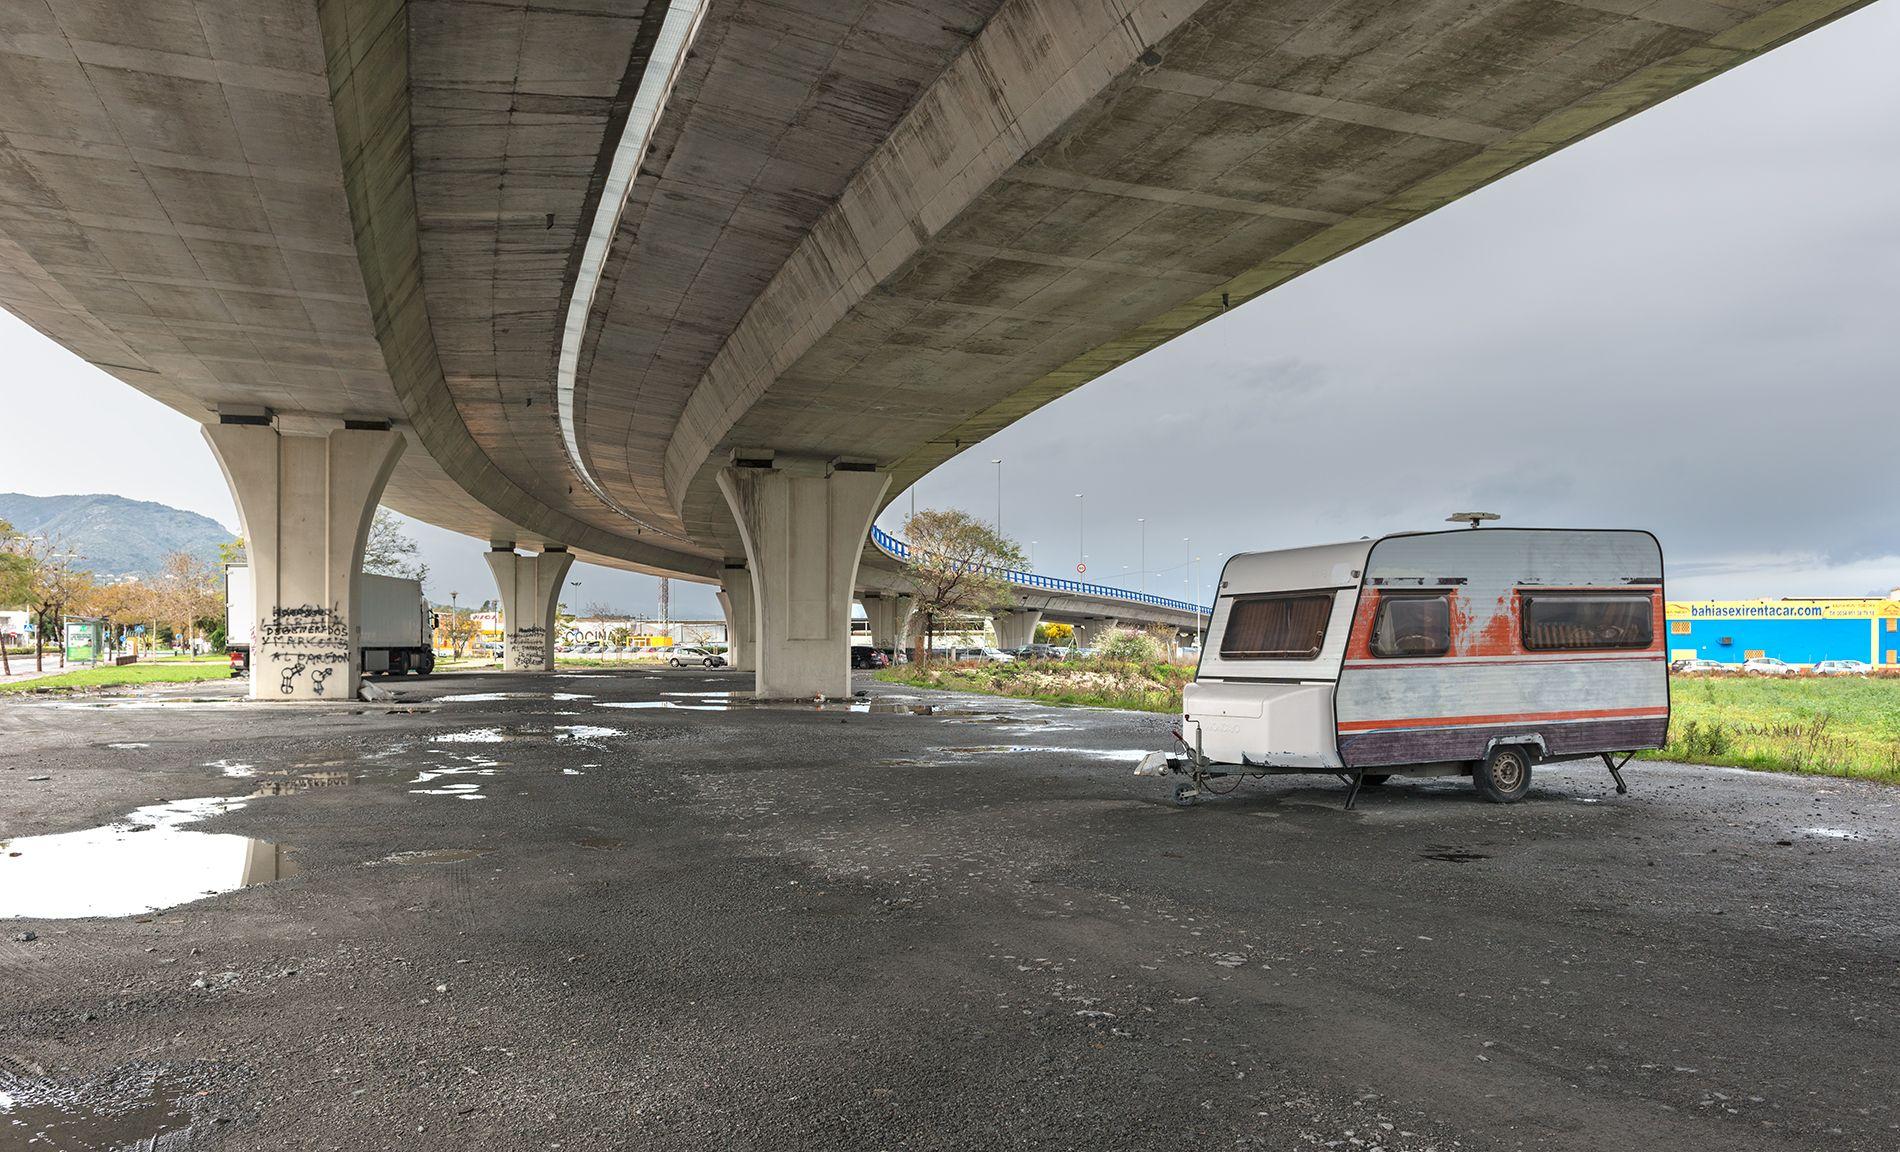 Caravana (vehículo)